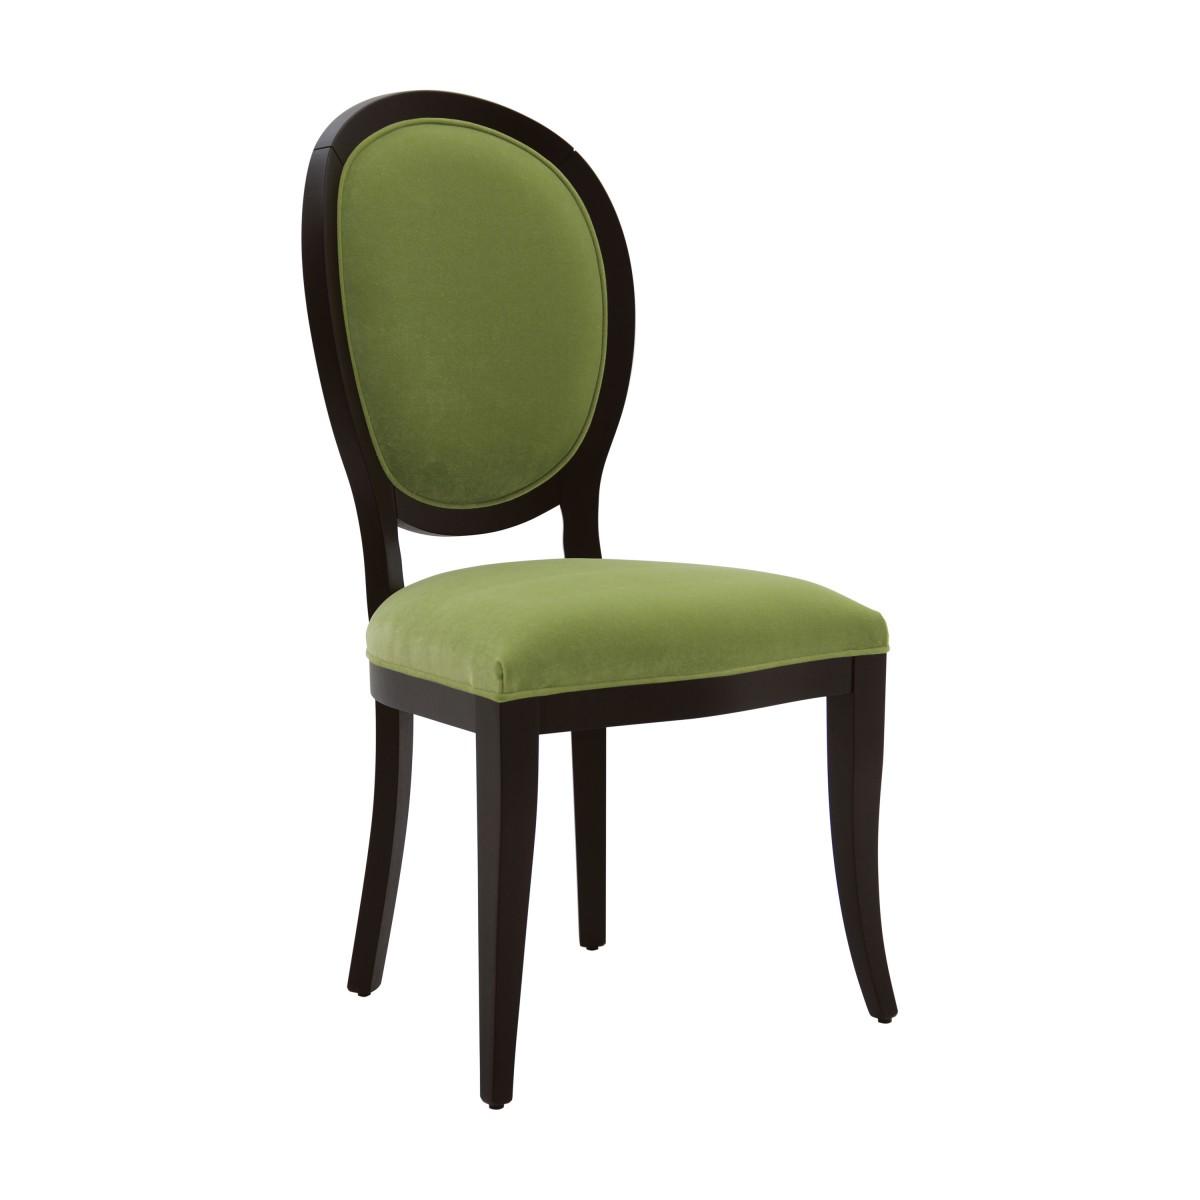 italian contemporary chair moderna 1 3940